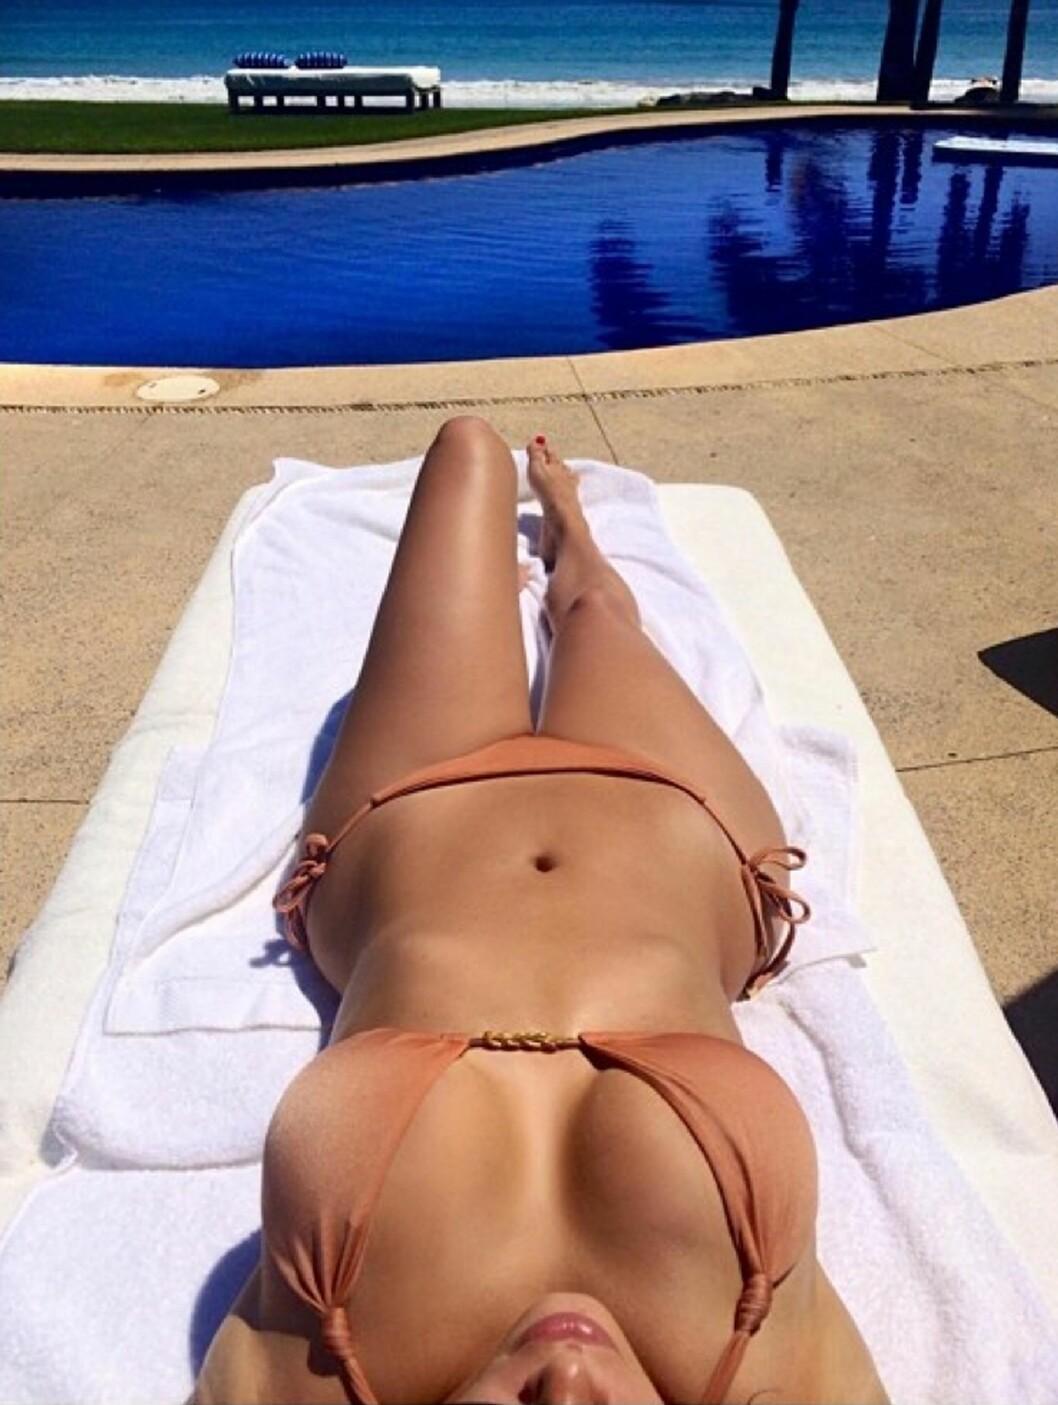 SELFIE: Kim tok en selfie av sin smukke bikinikropp i Thailand.  Foto: Supplied by LMK Media/All Over P